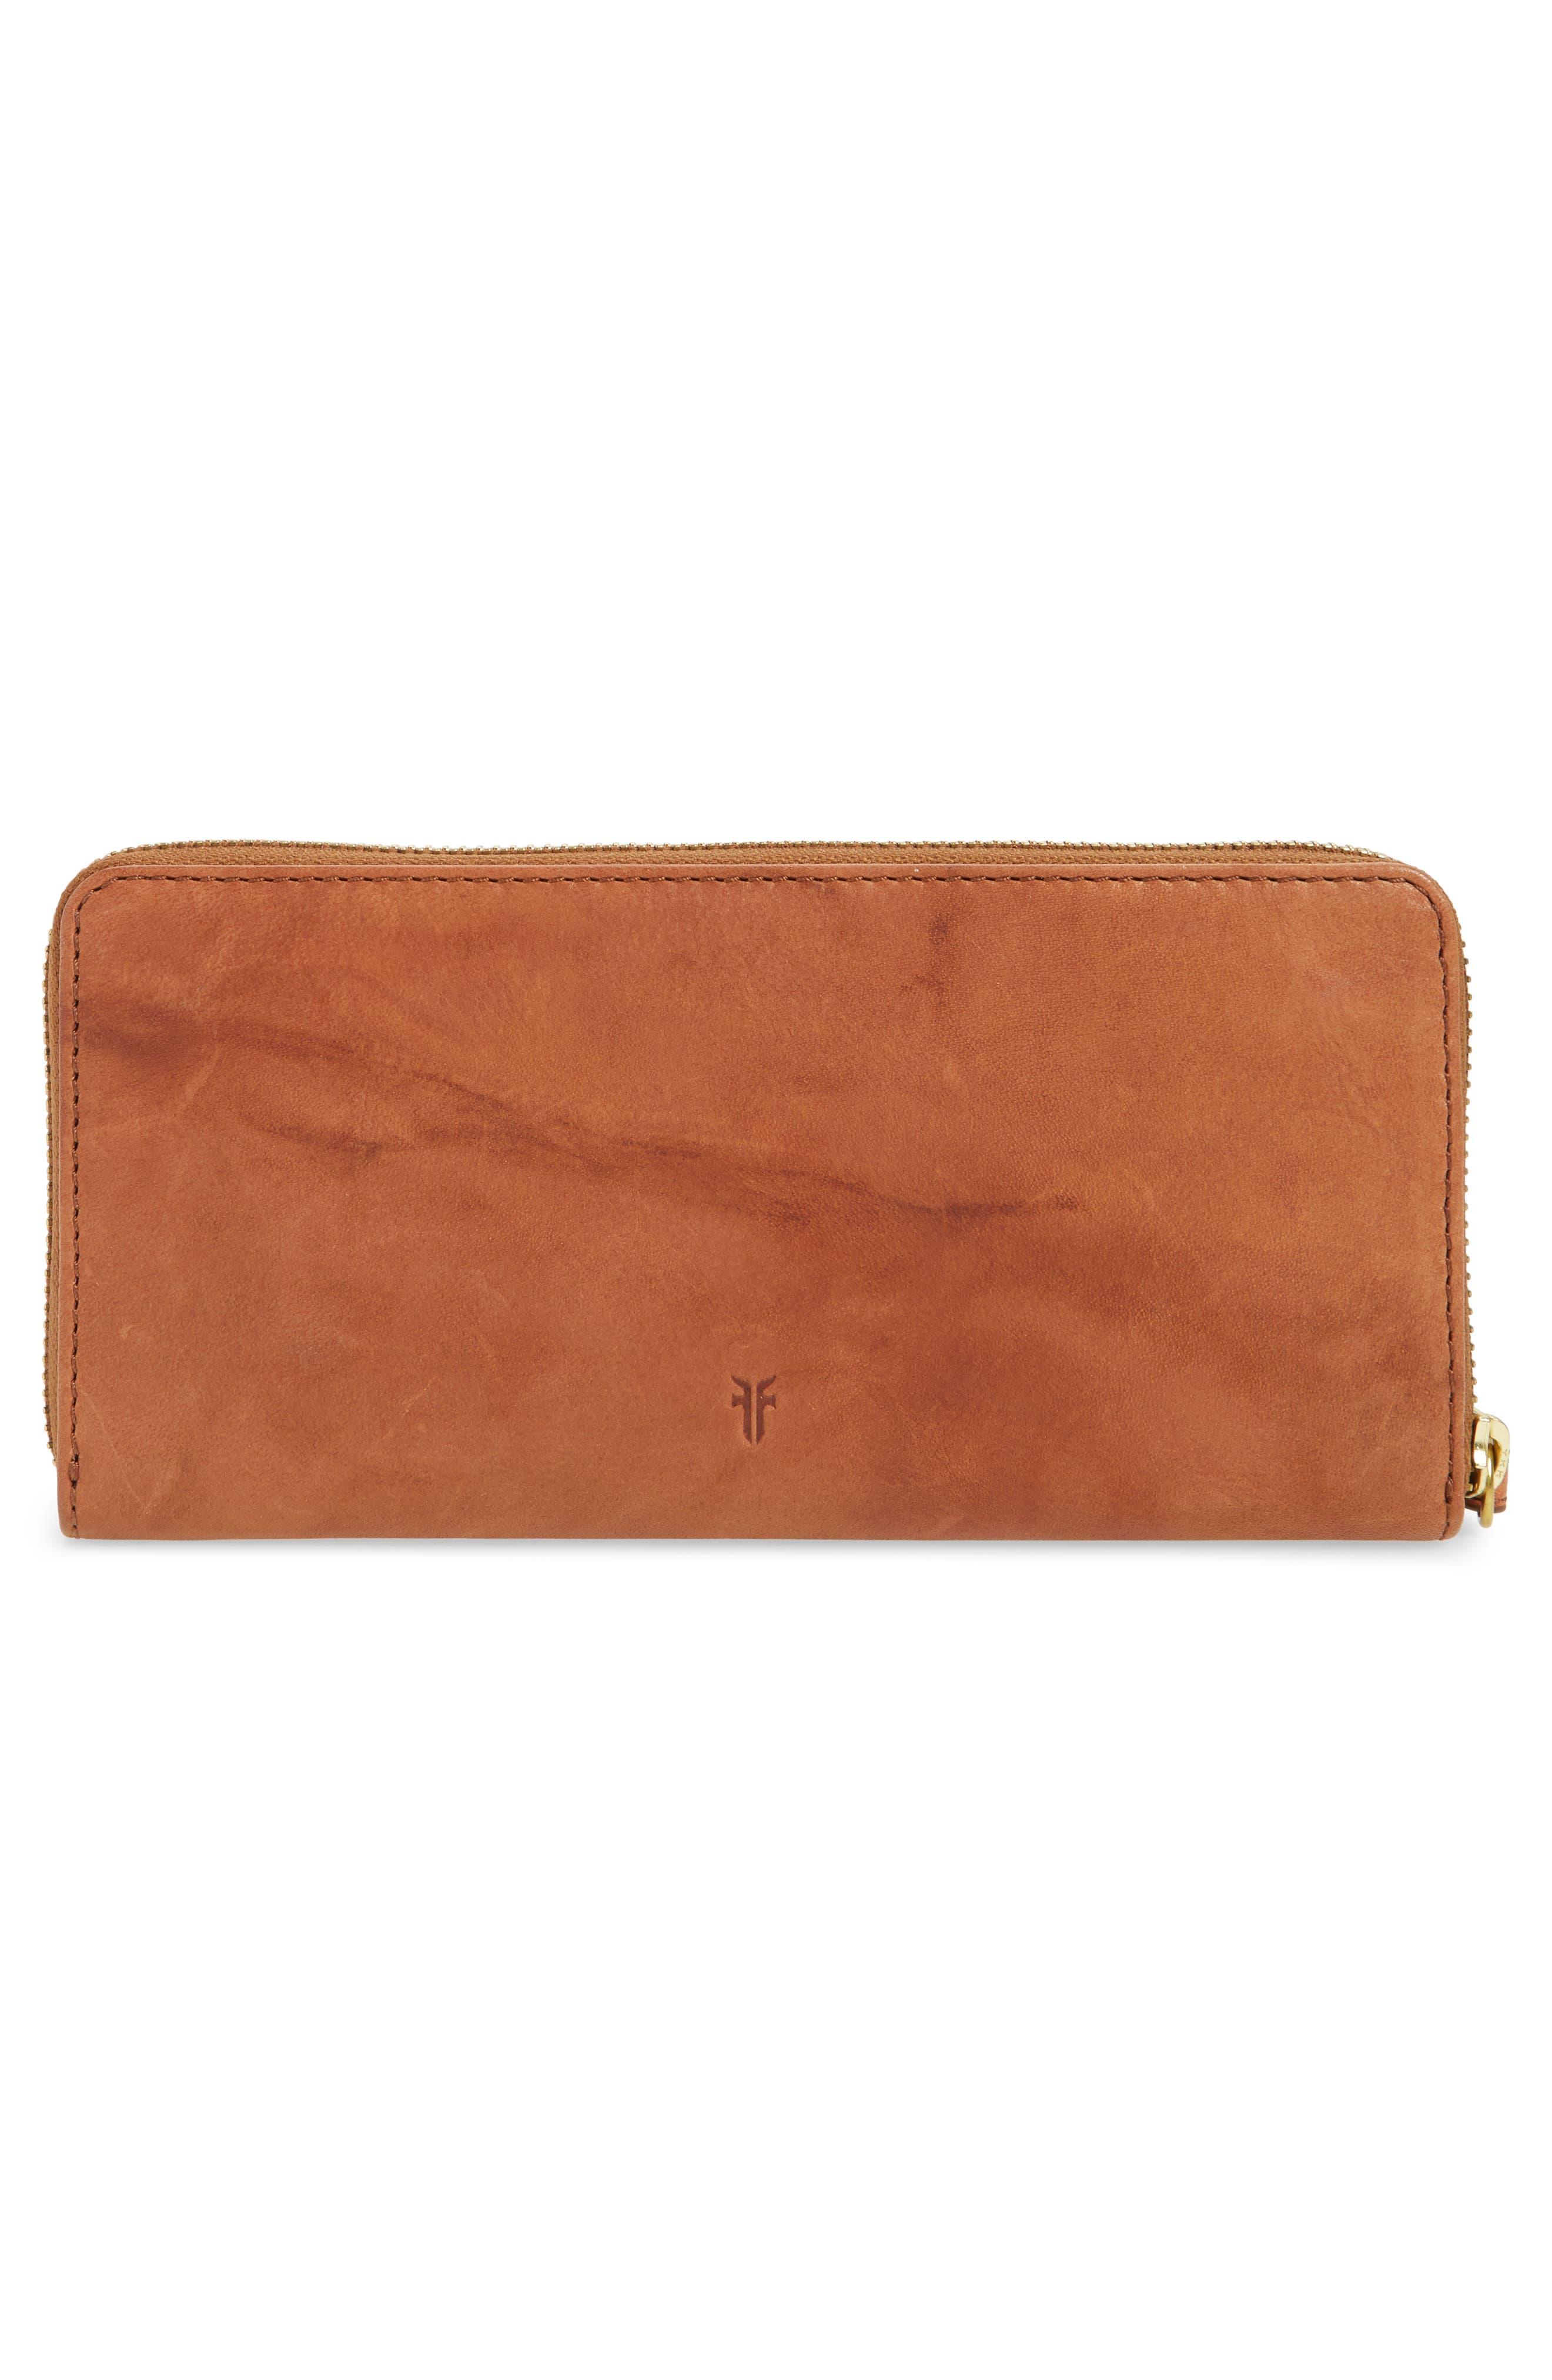 Campus Rivet Leather Continental Zip Wallet,                             Alternate thumbnail 8, color,